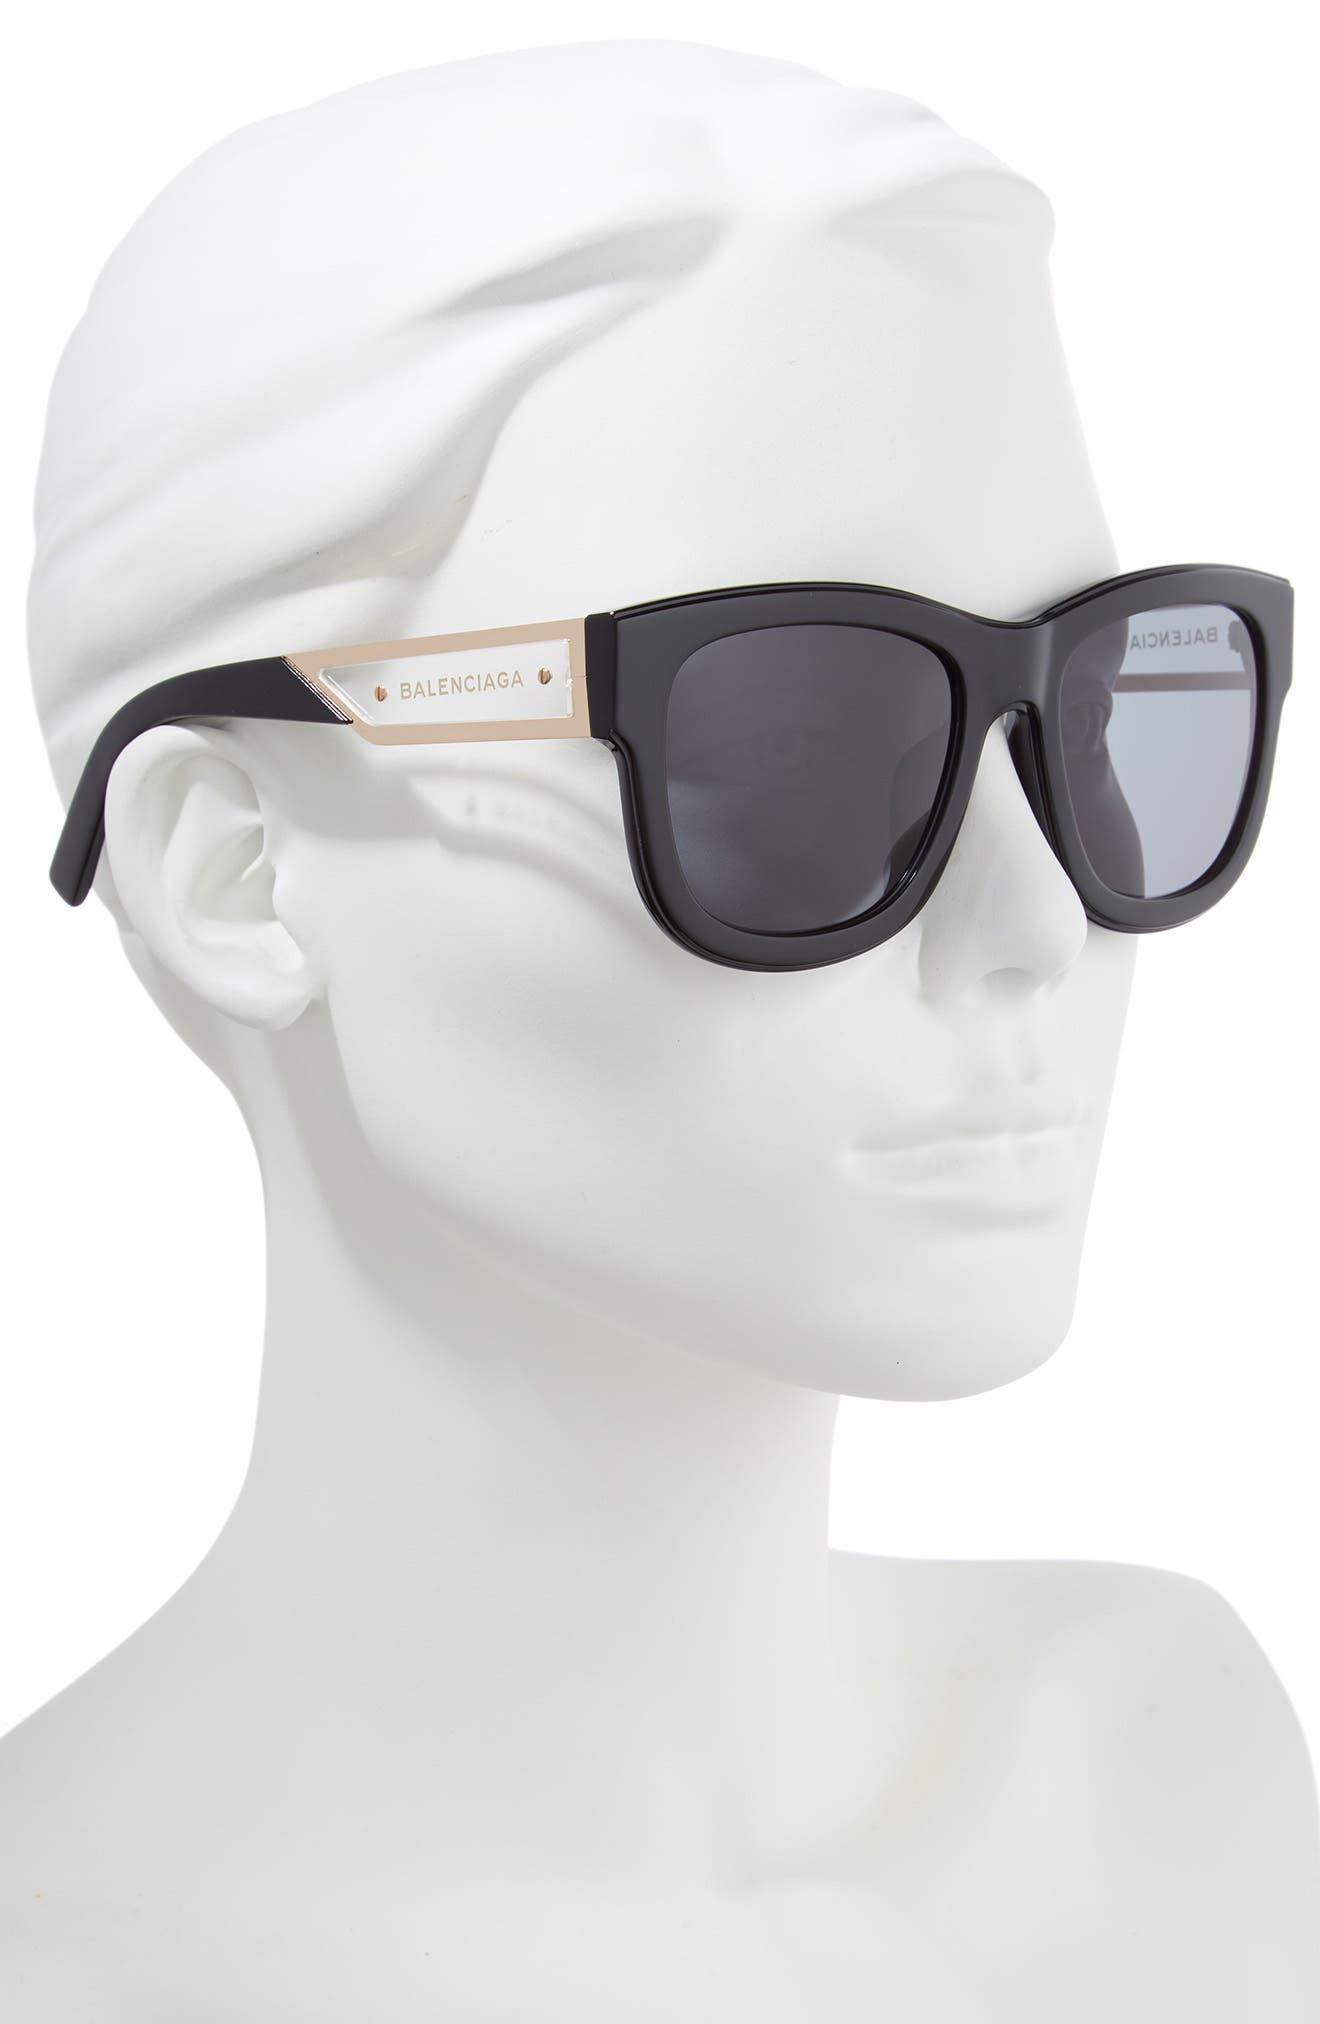 BALENCIAGA,                             56mm Cat Eye Sunglasses,                             Alternate thumbnail 2, color,                             018